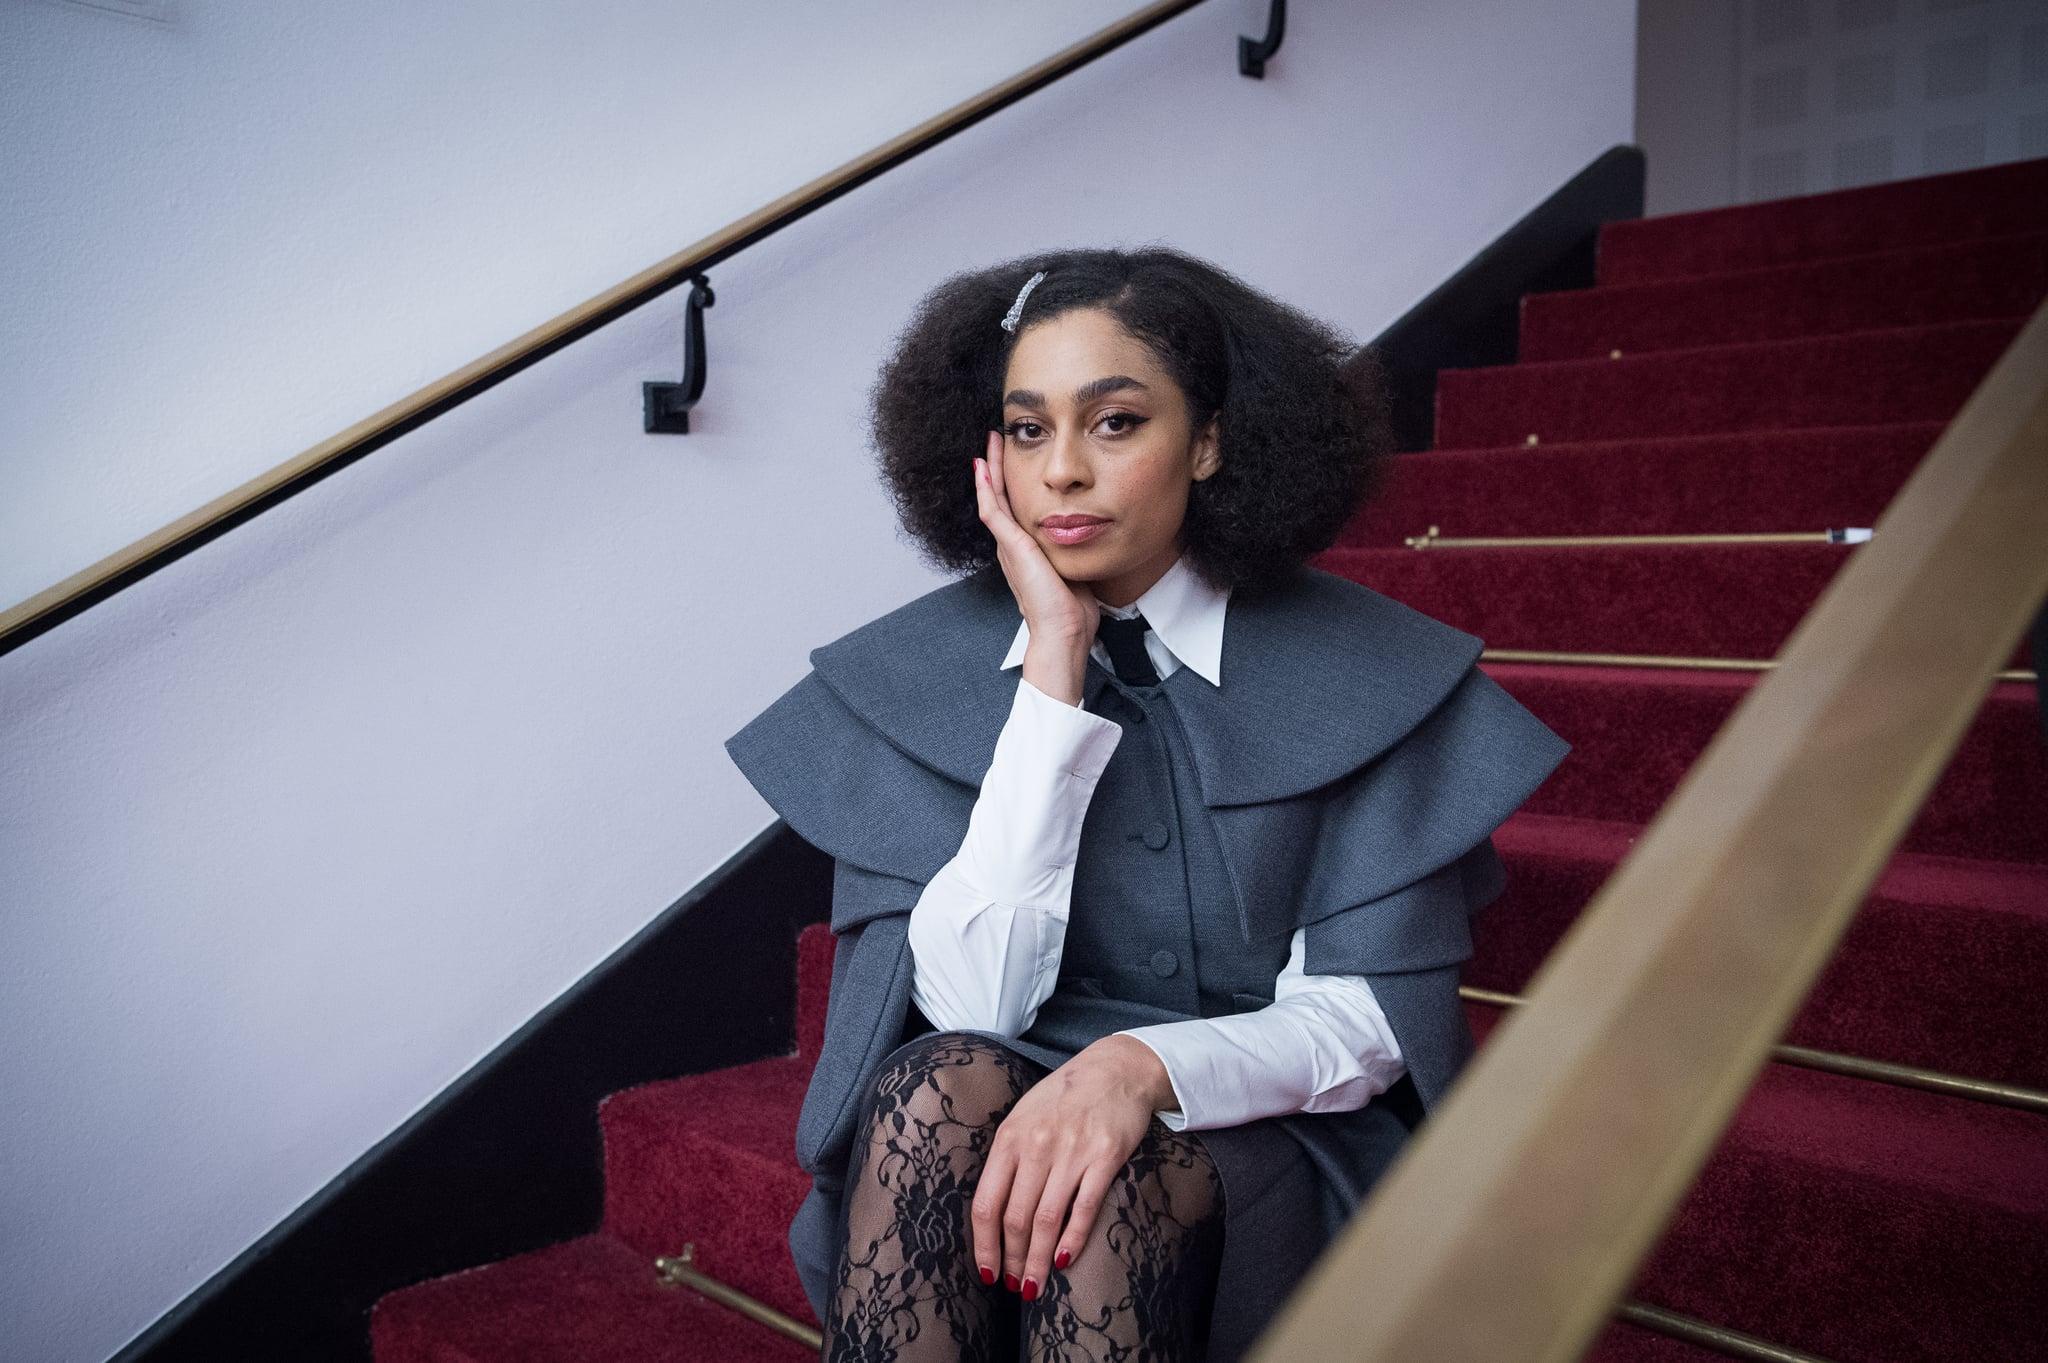 PARIS, FRANCE - NOVEMBER 23:  Celeste poses for exclusive portrait session at Salle Pleyel on November 23, 2019 in Paris, France.  (Photo by David Wolff - Patrick/Redferns)